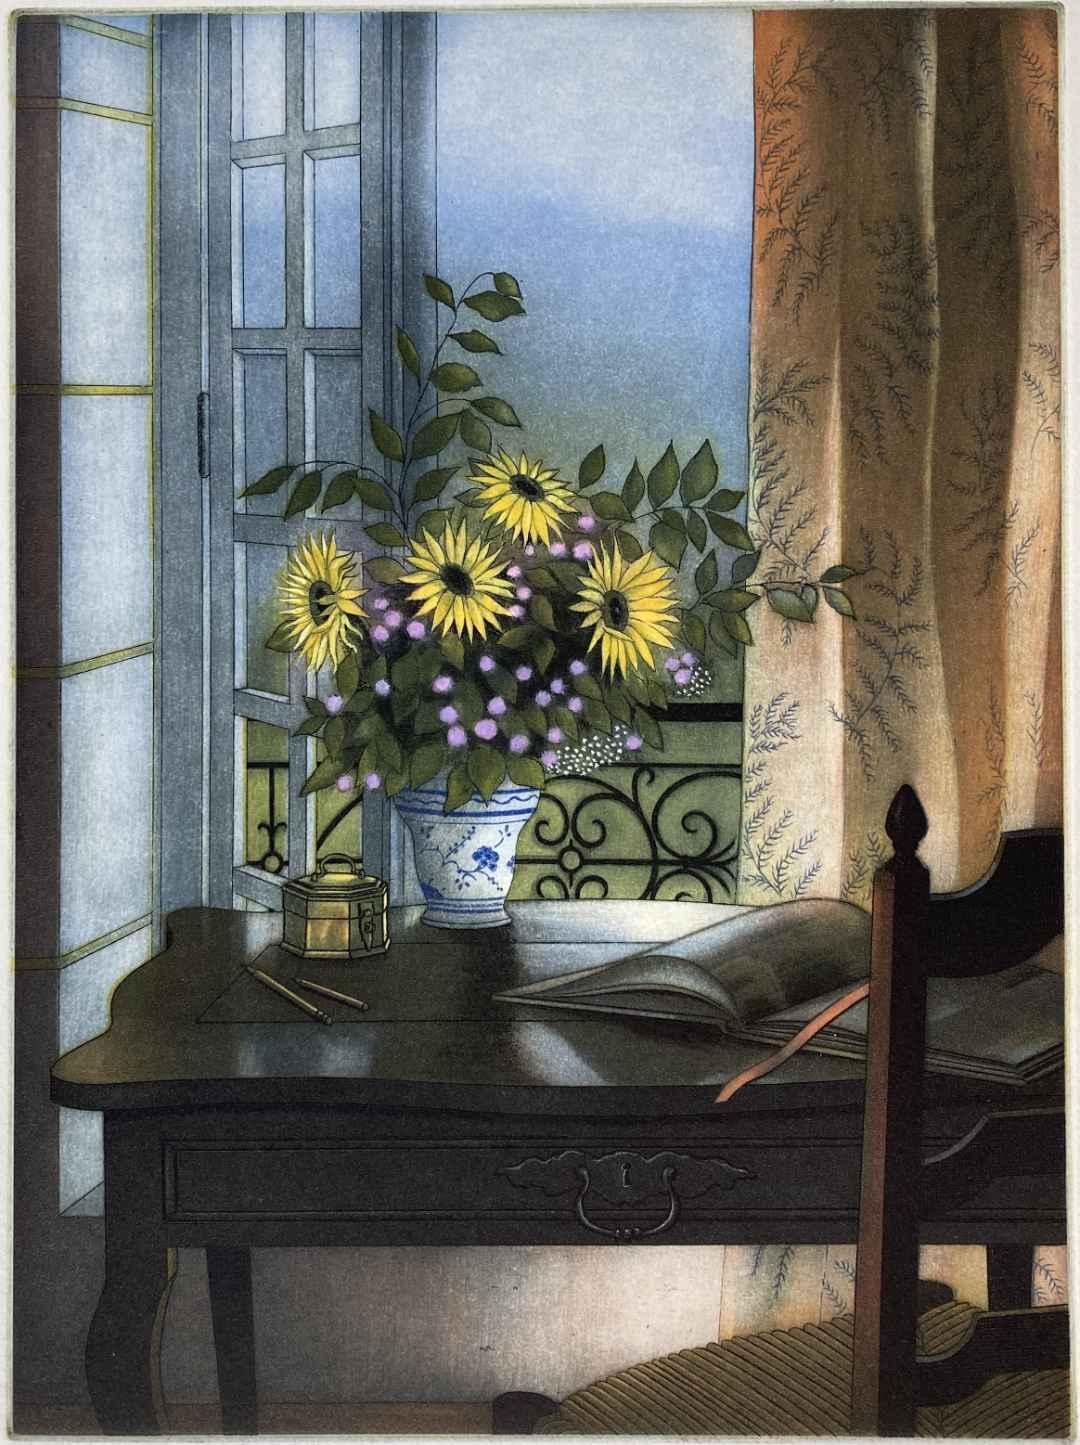 Lynn Shaler - La Belle Saison